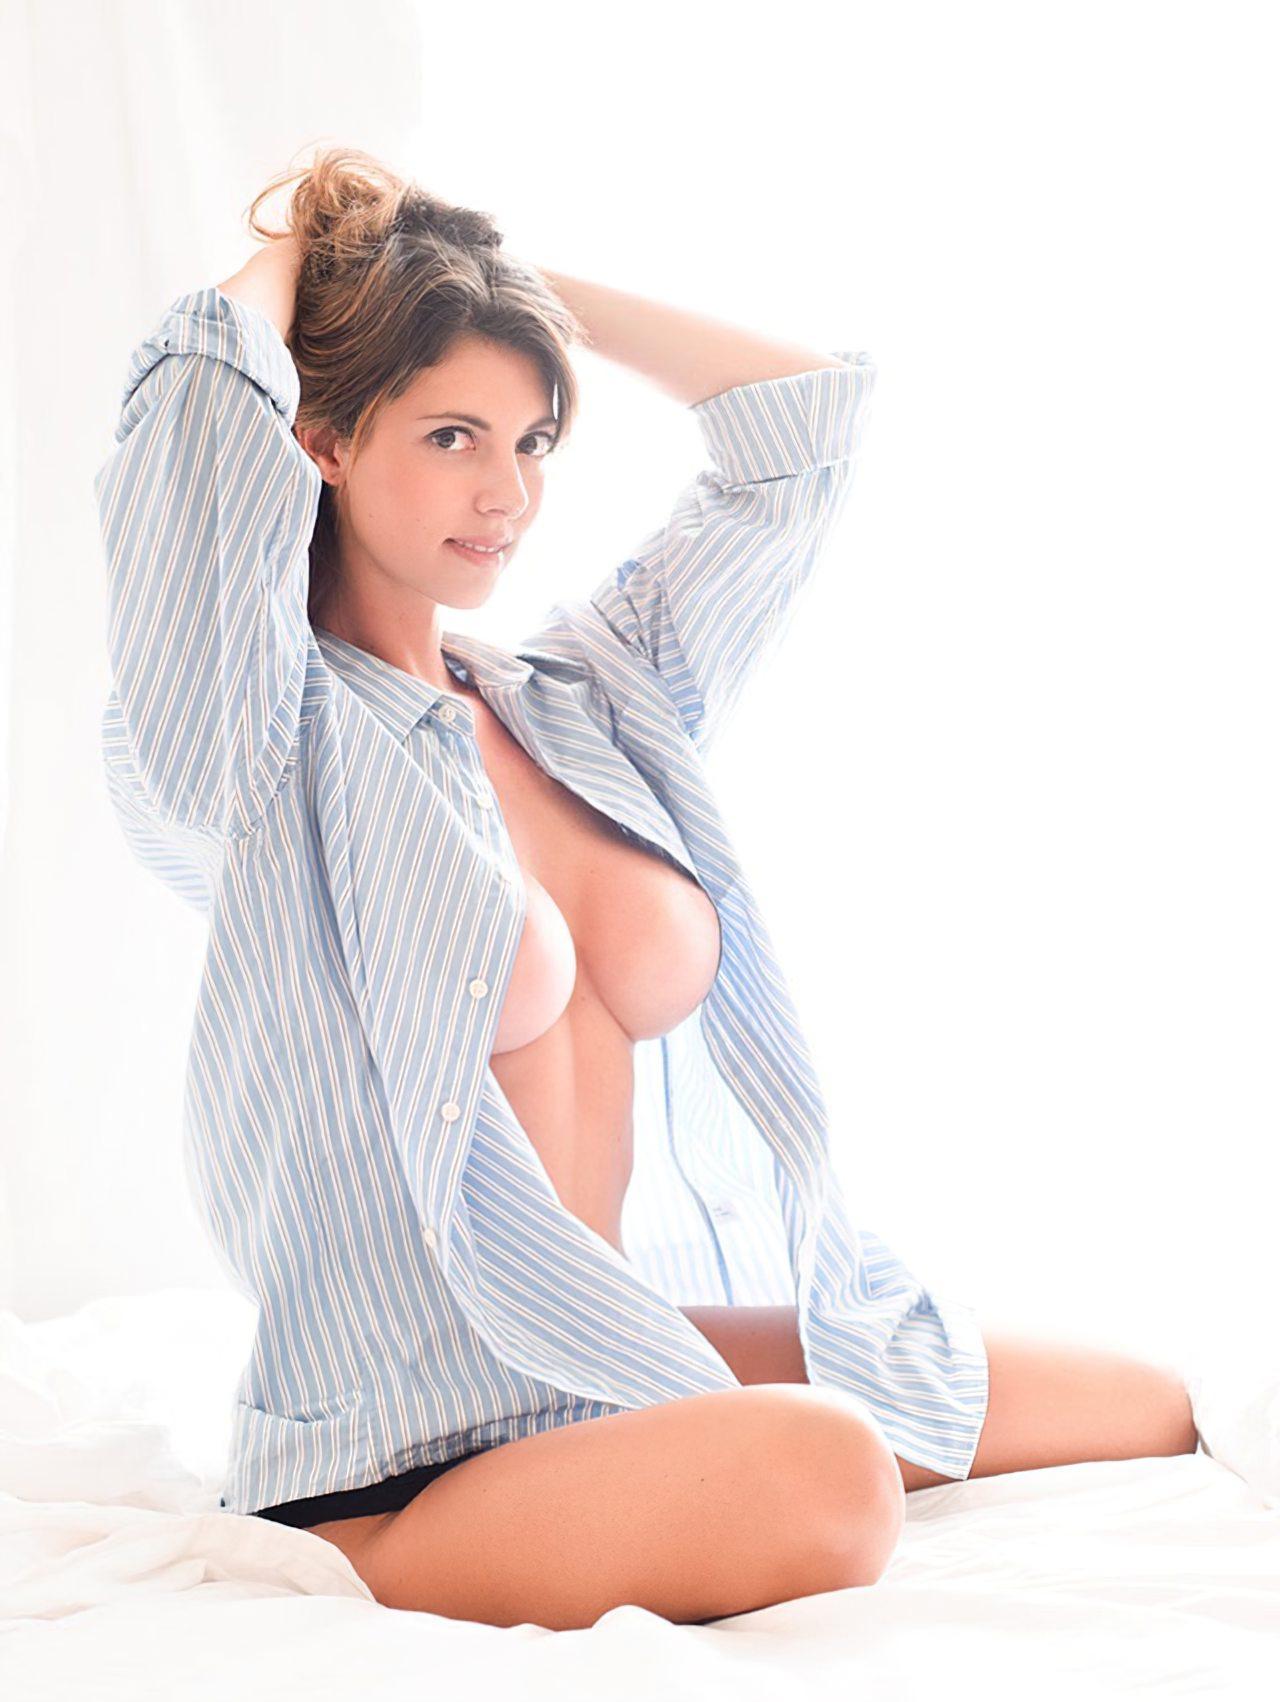 Lilly Lee Nua (27)